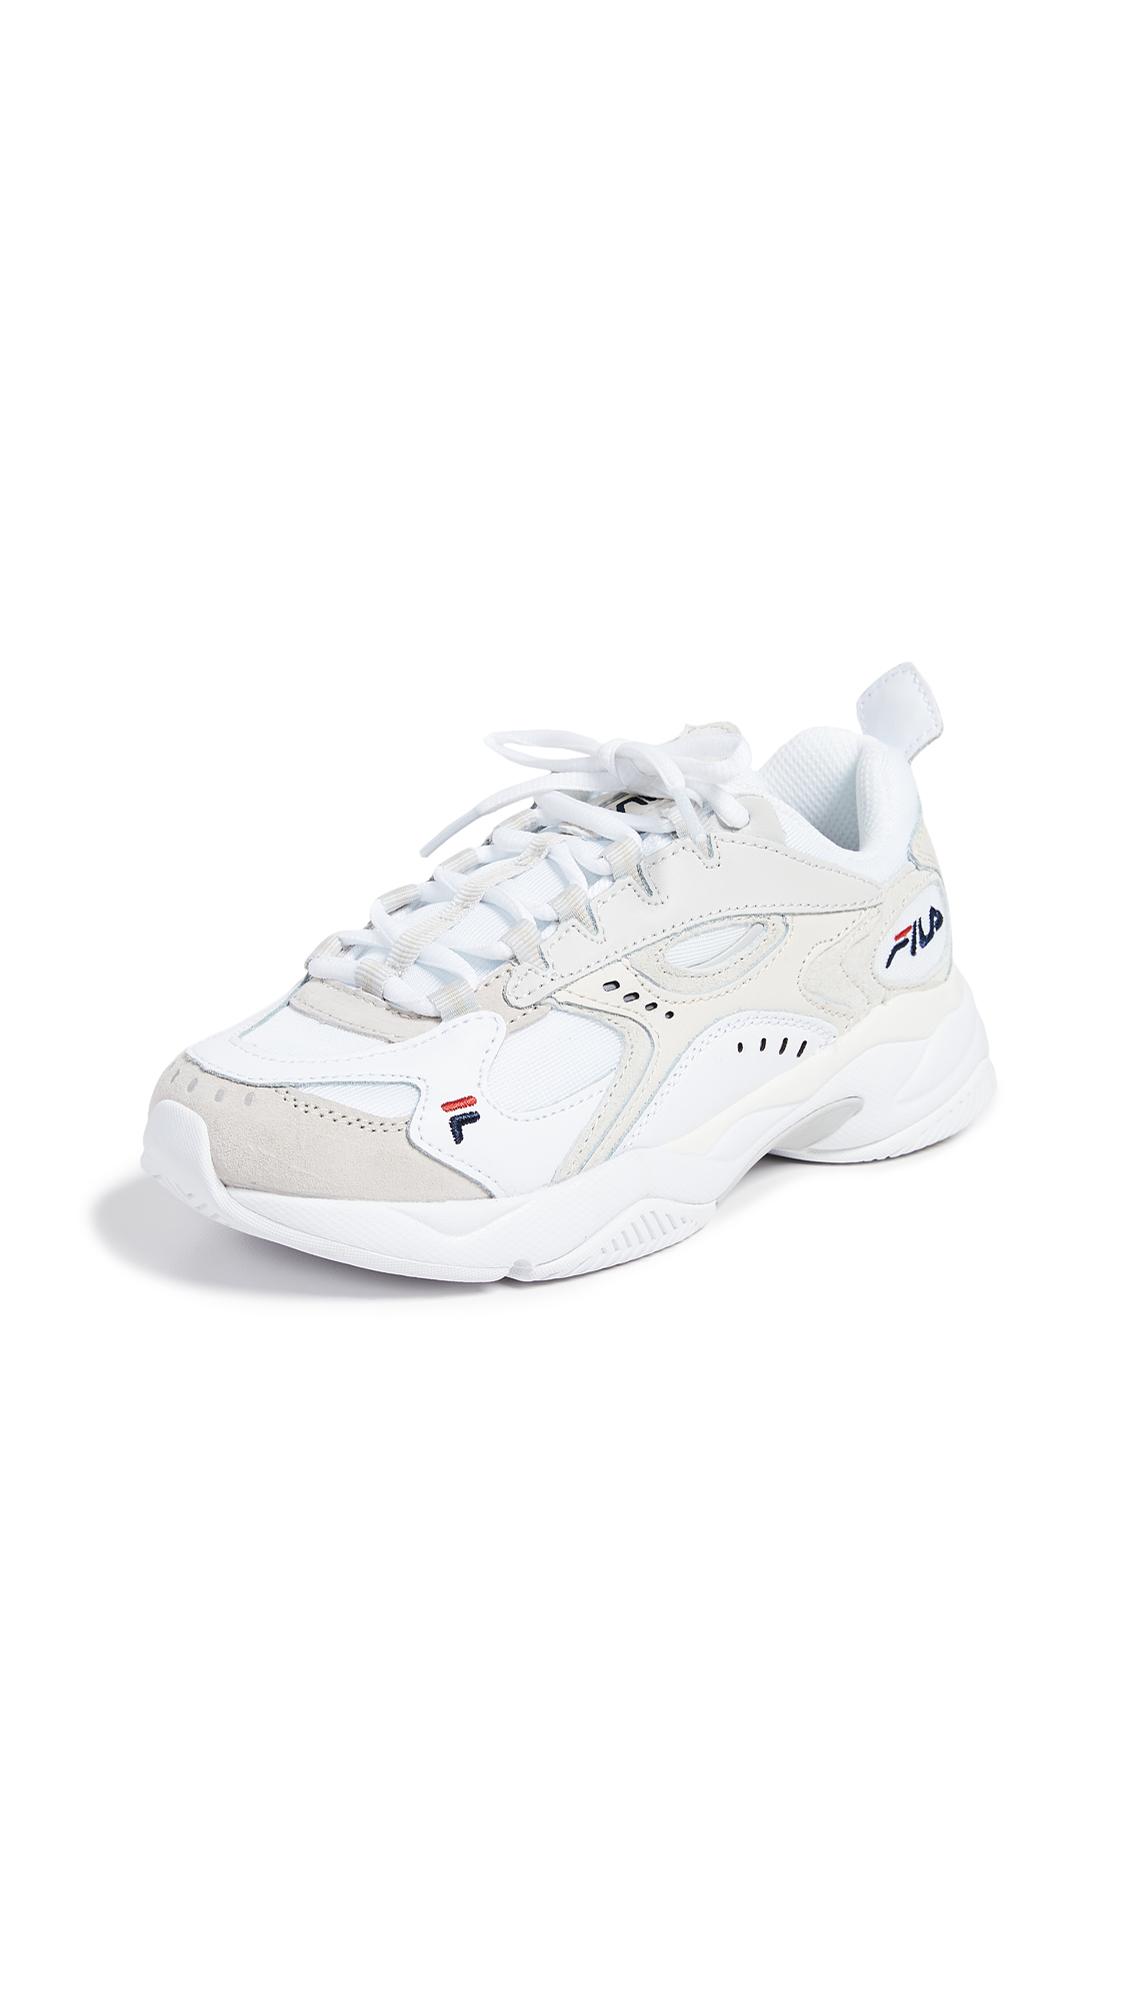 Fila Boveasorus Sneakers - White/Gardenia/Silver Birch